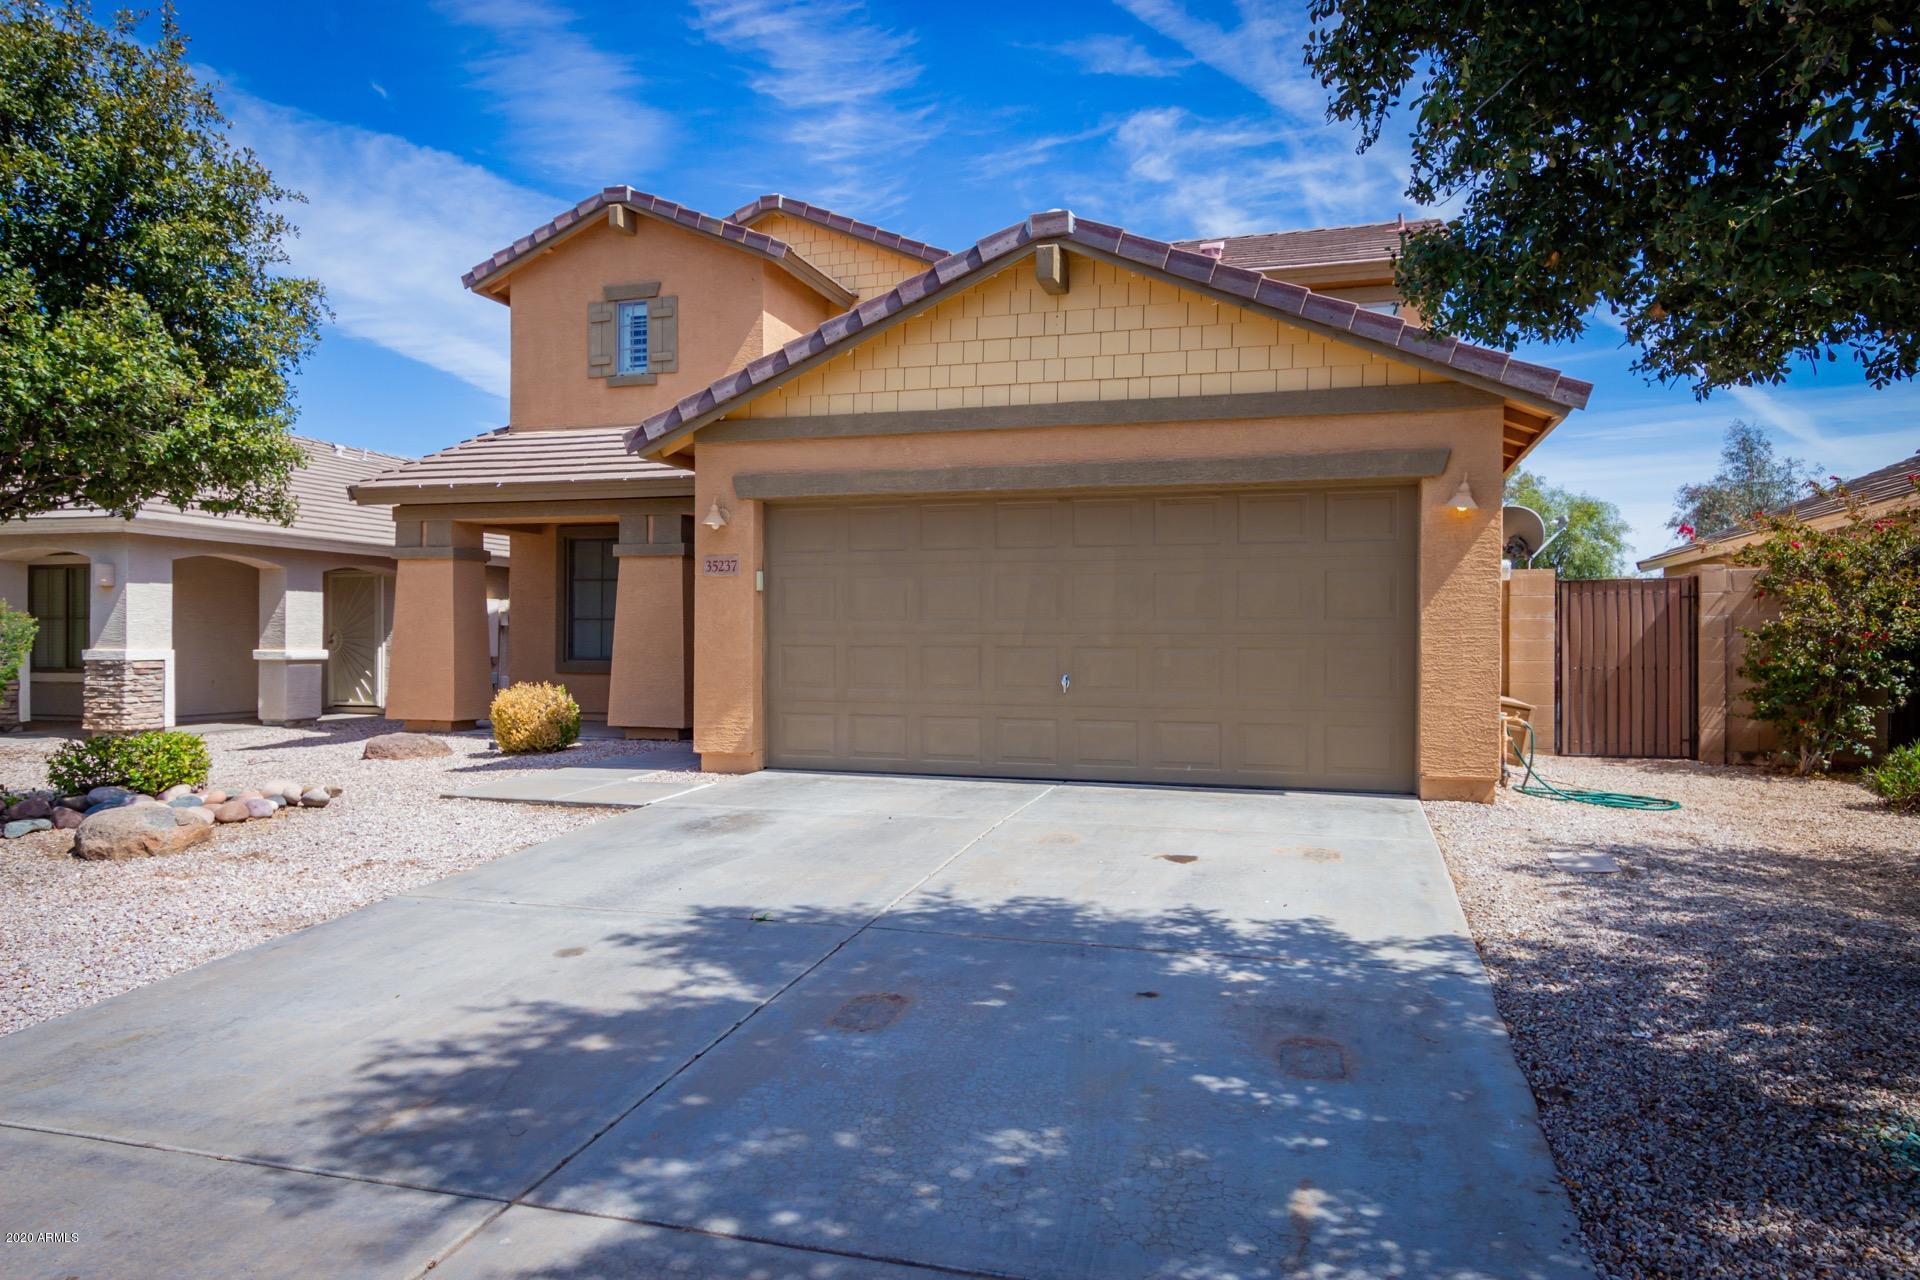 Photo of 35237 N BANDOLIER Drive, Queen Creek, AZ 85142